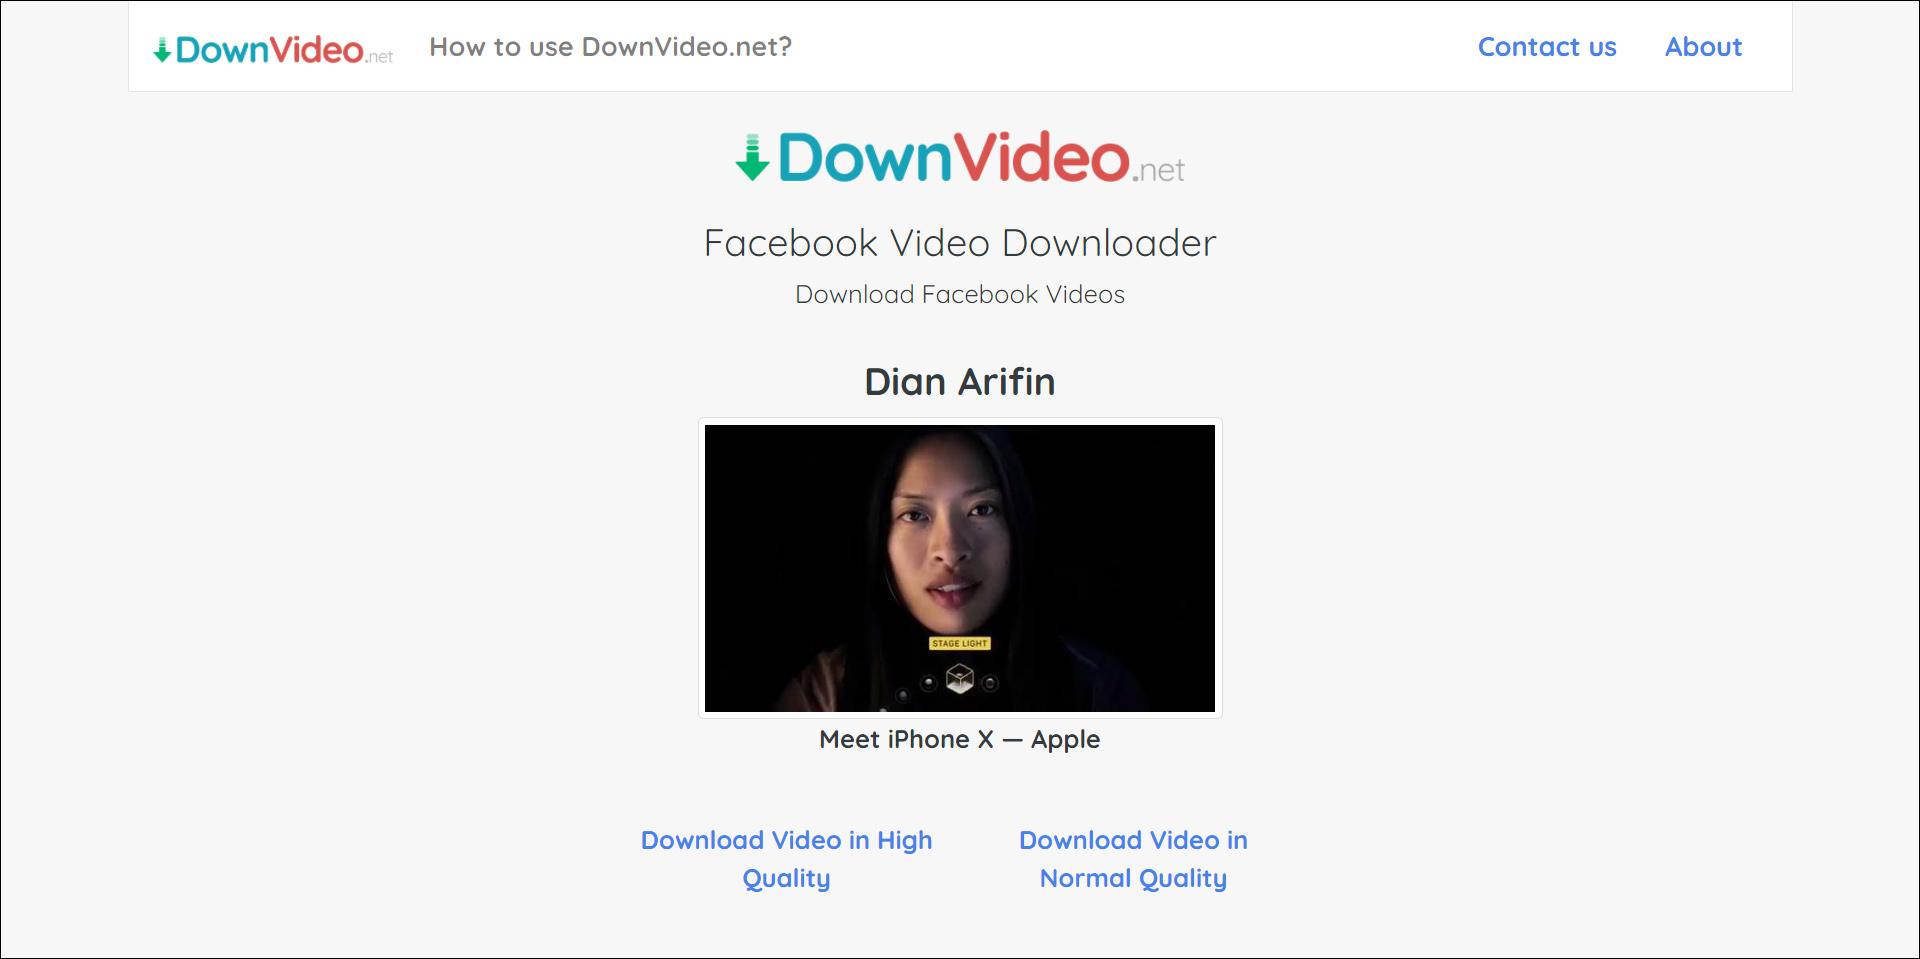 2 Unduh video Facebook dari DownVideo